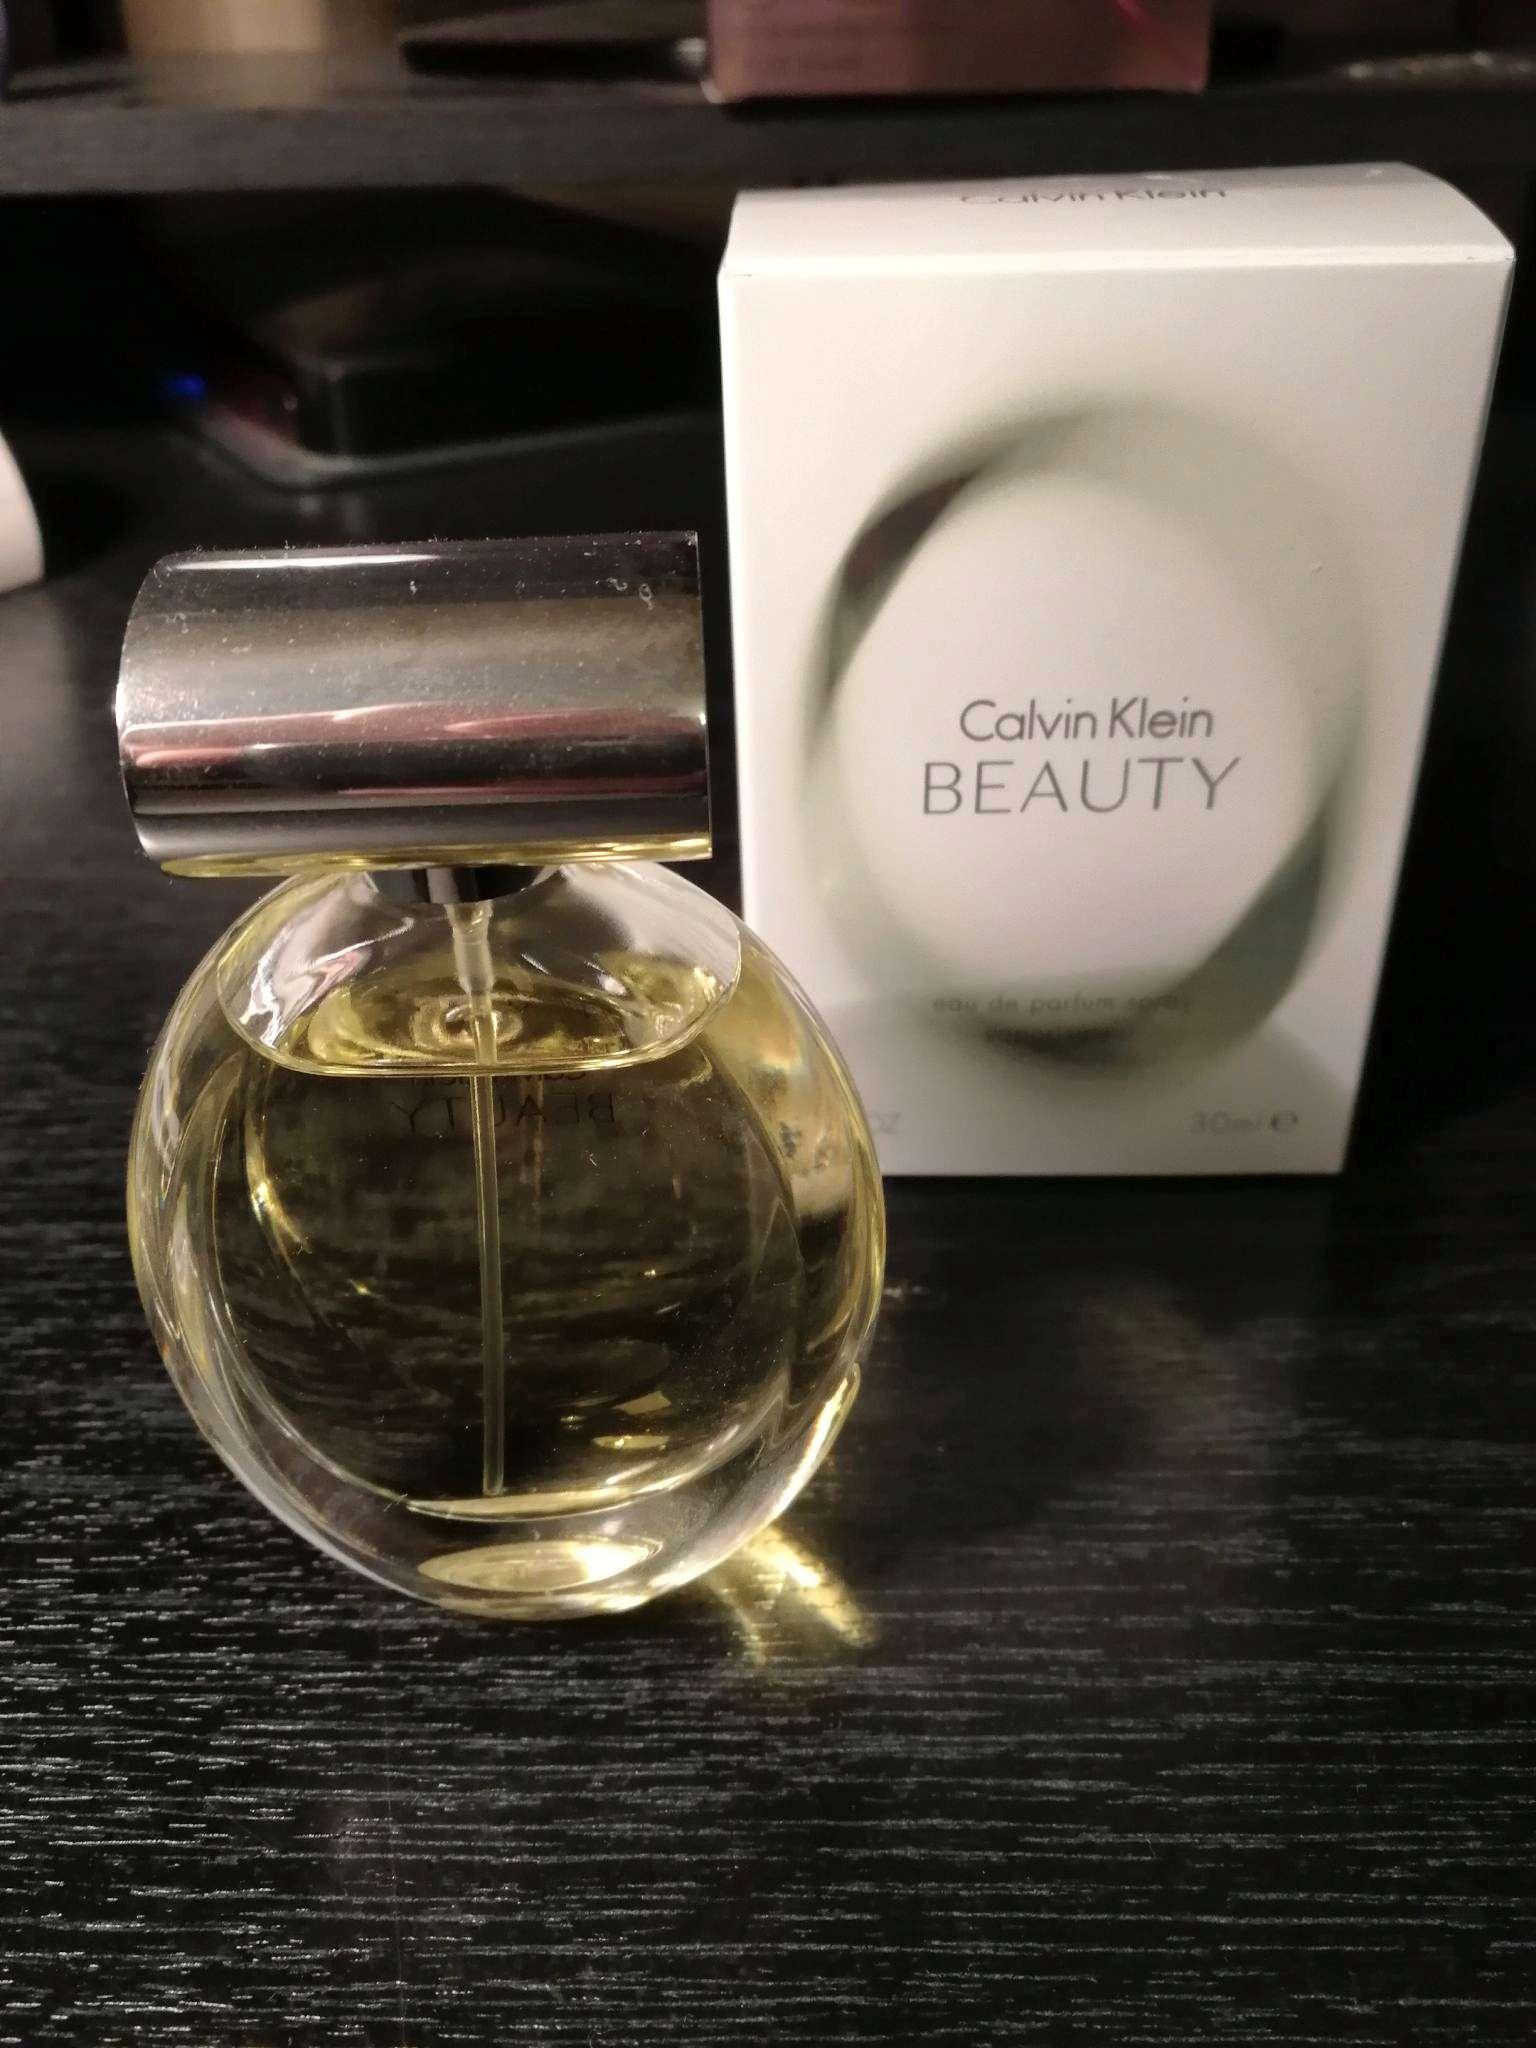 8fb9acde763cd Женская парфюмерная вода CALVIN KLEIN Beauty, 30 мл — купить в ...